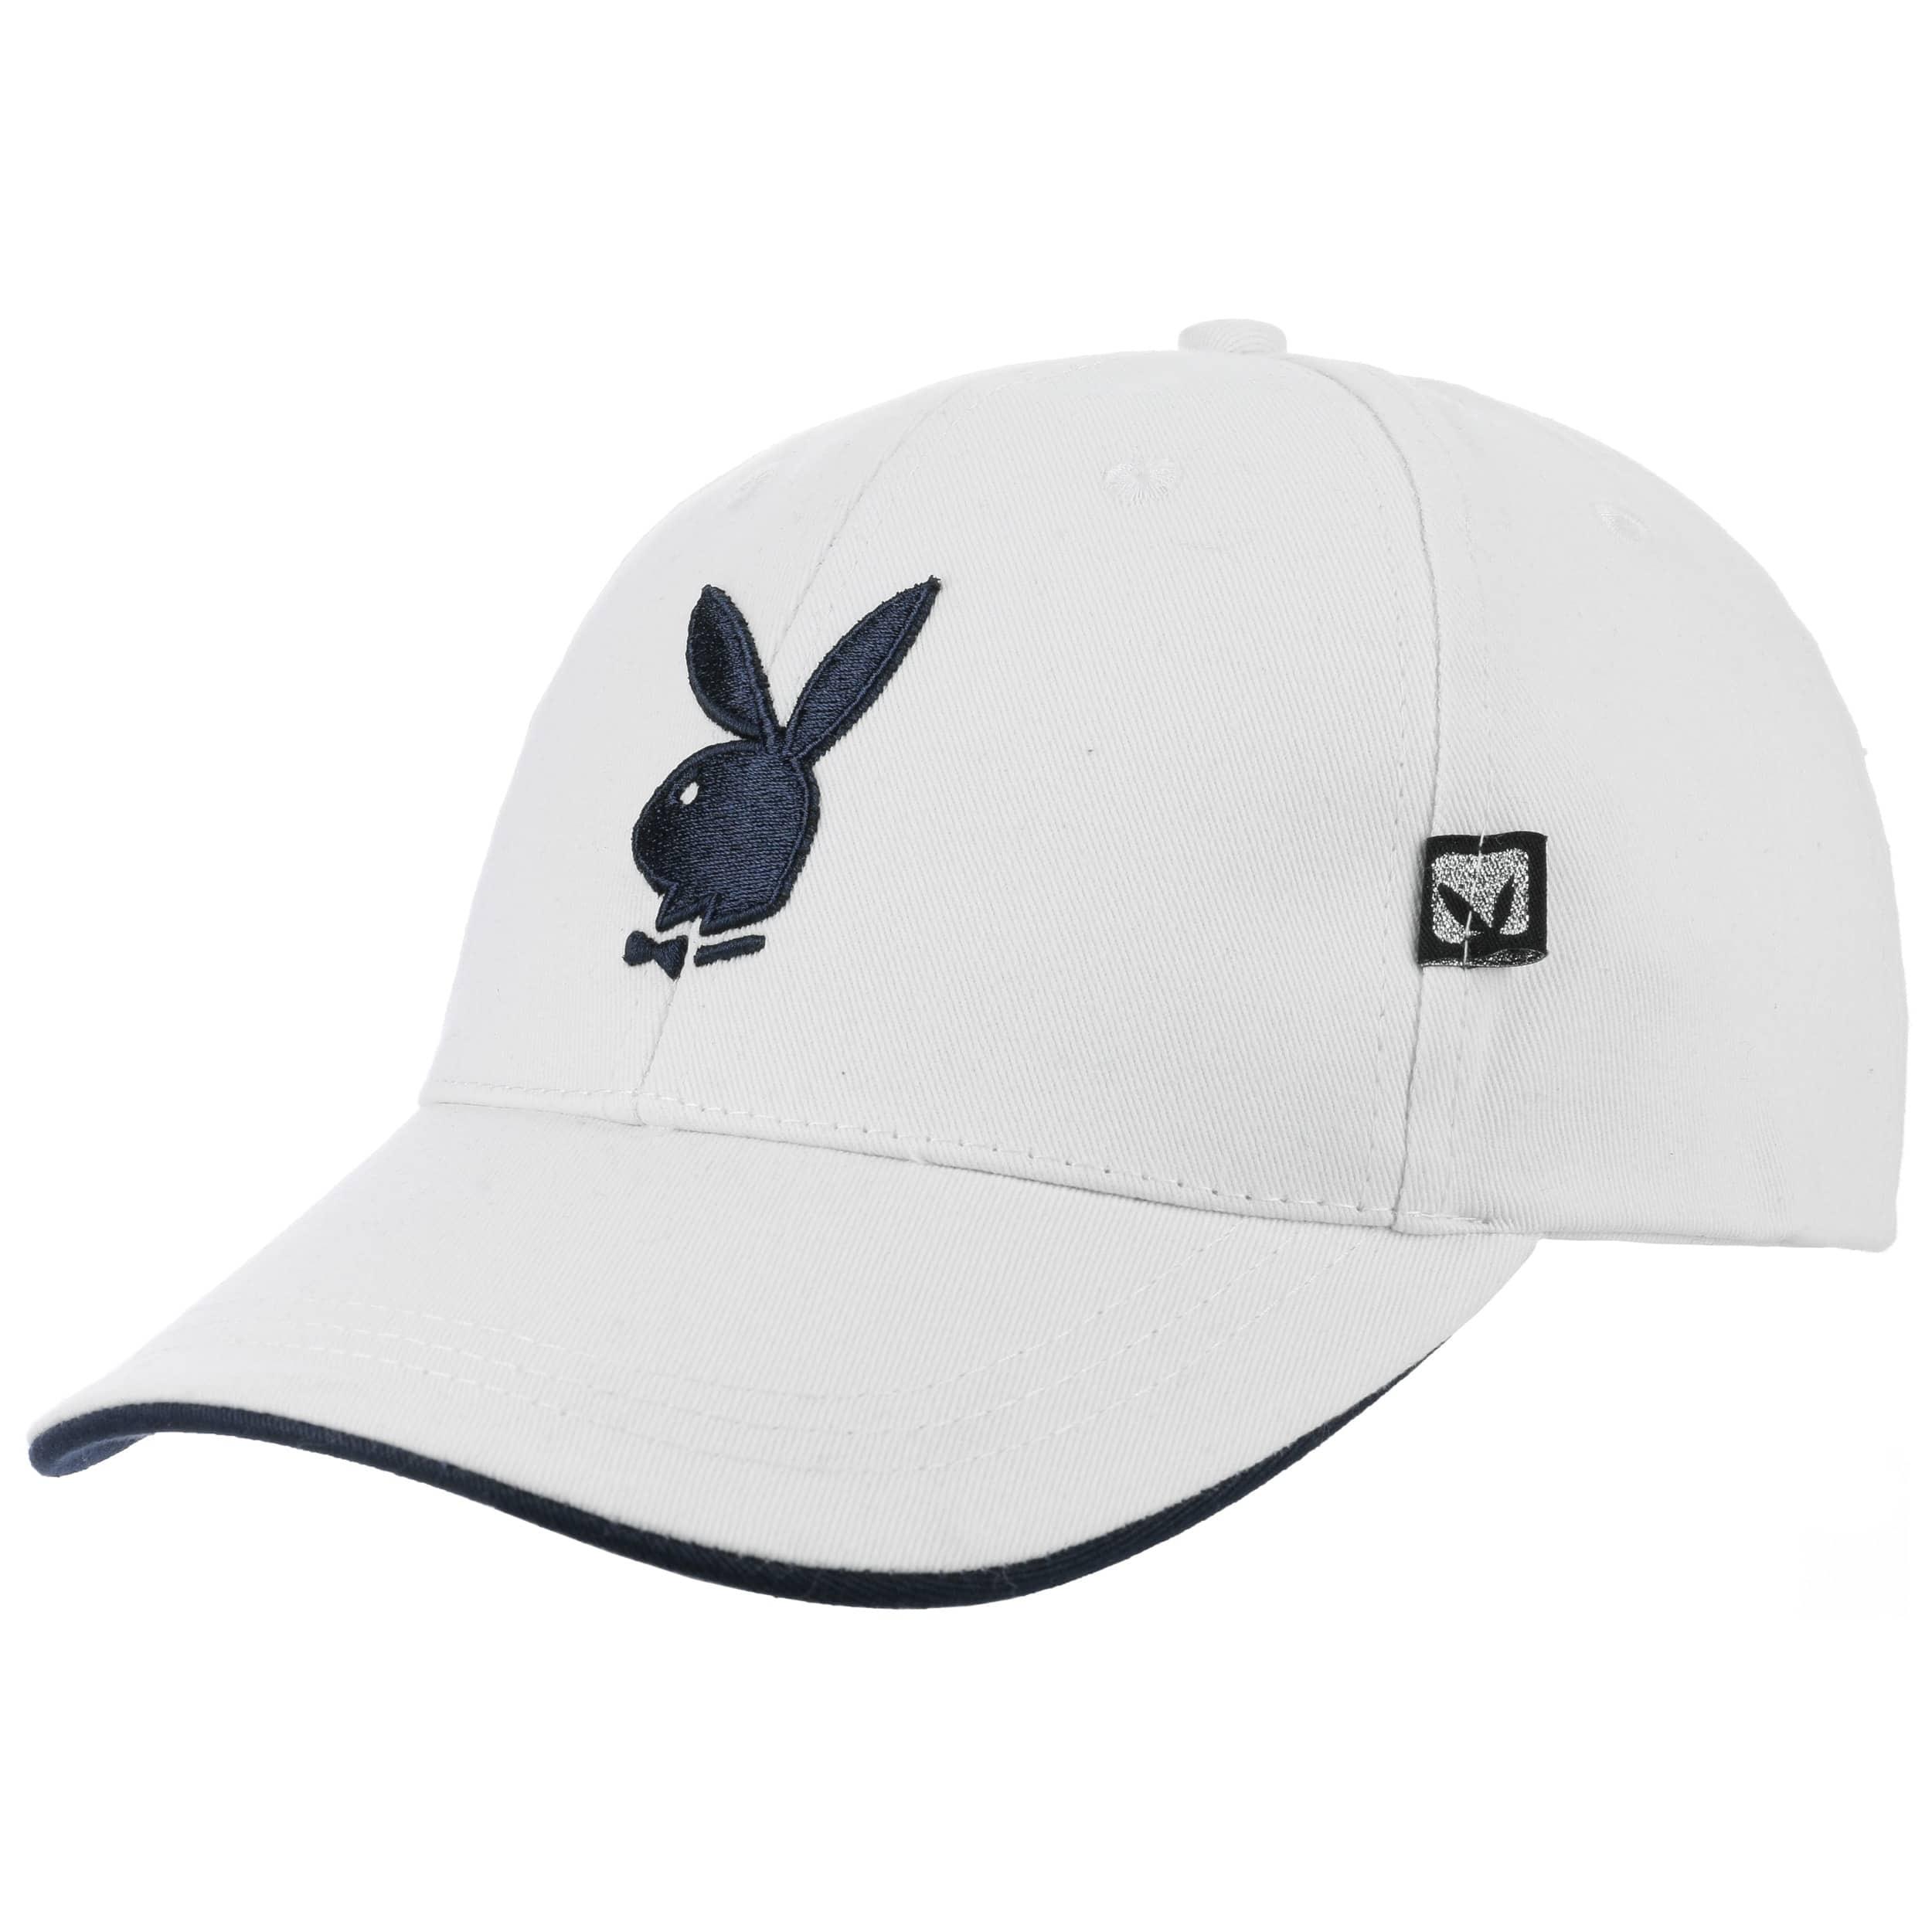 Q64 Vampires Unisex Adult Cowboy Hat Outdoor Sports Hat Adjustable Baseball Cap